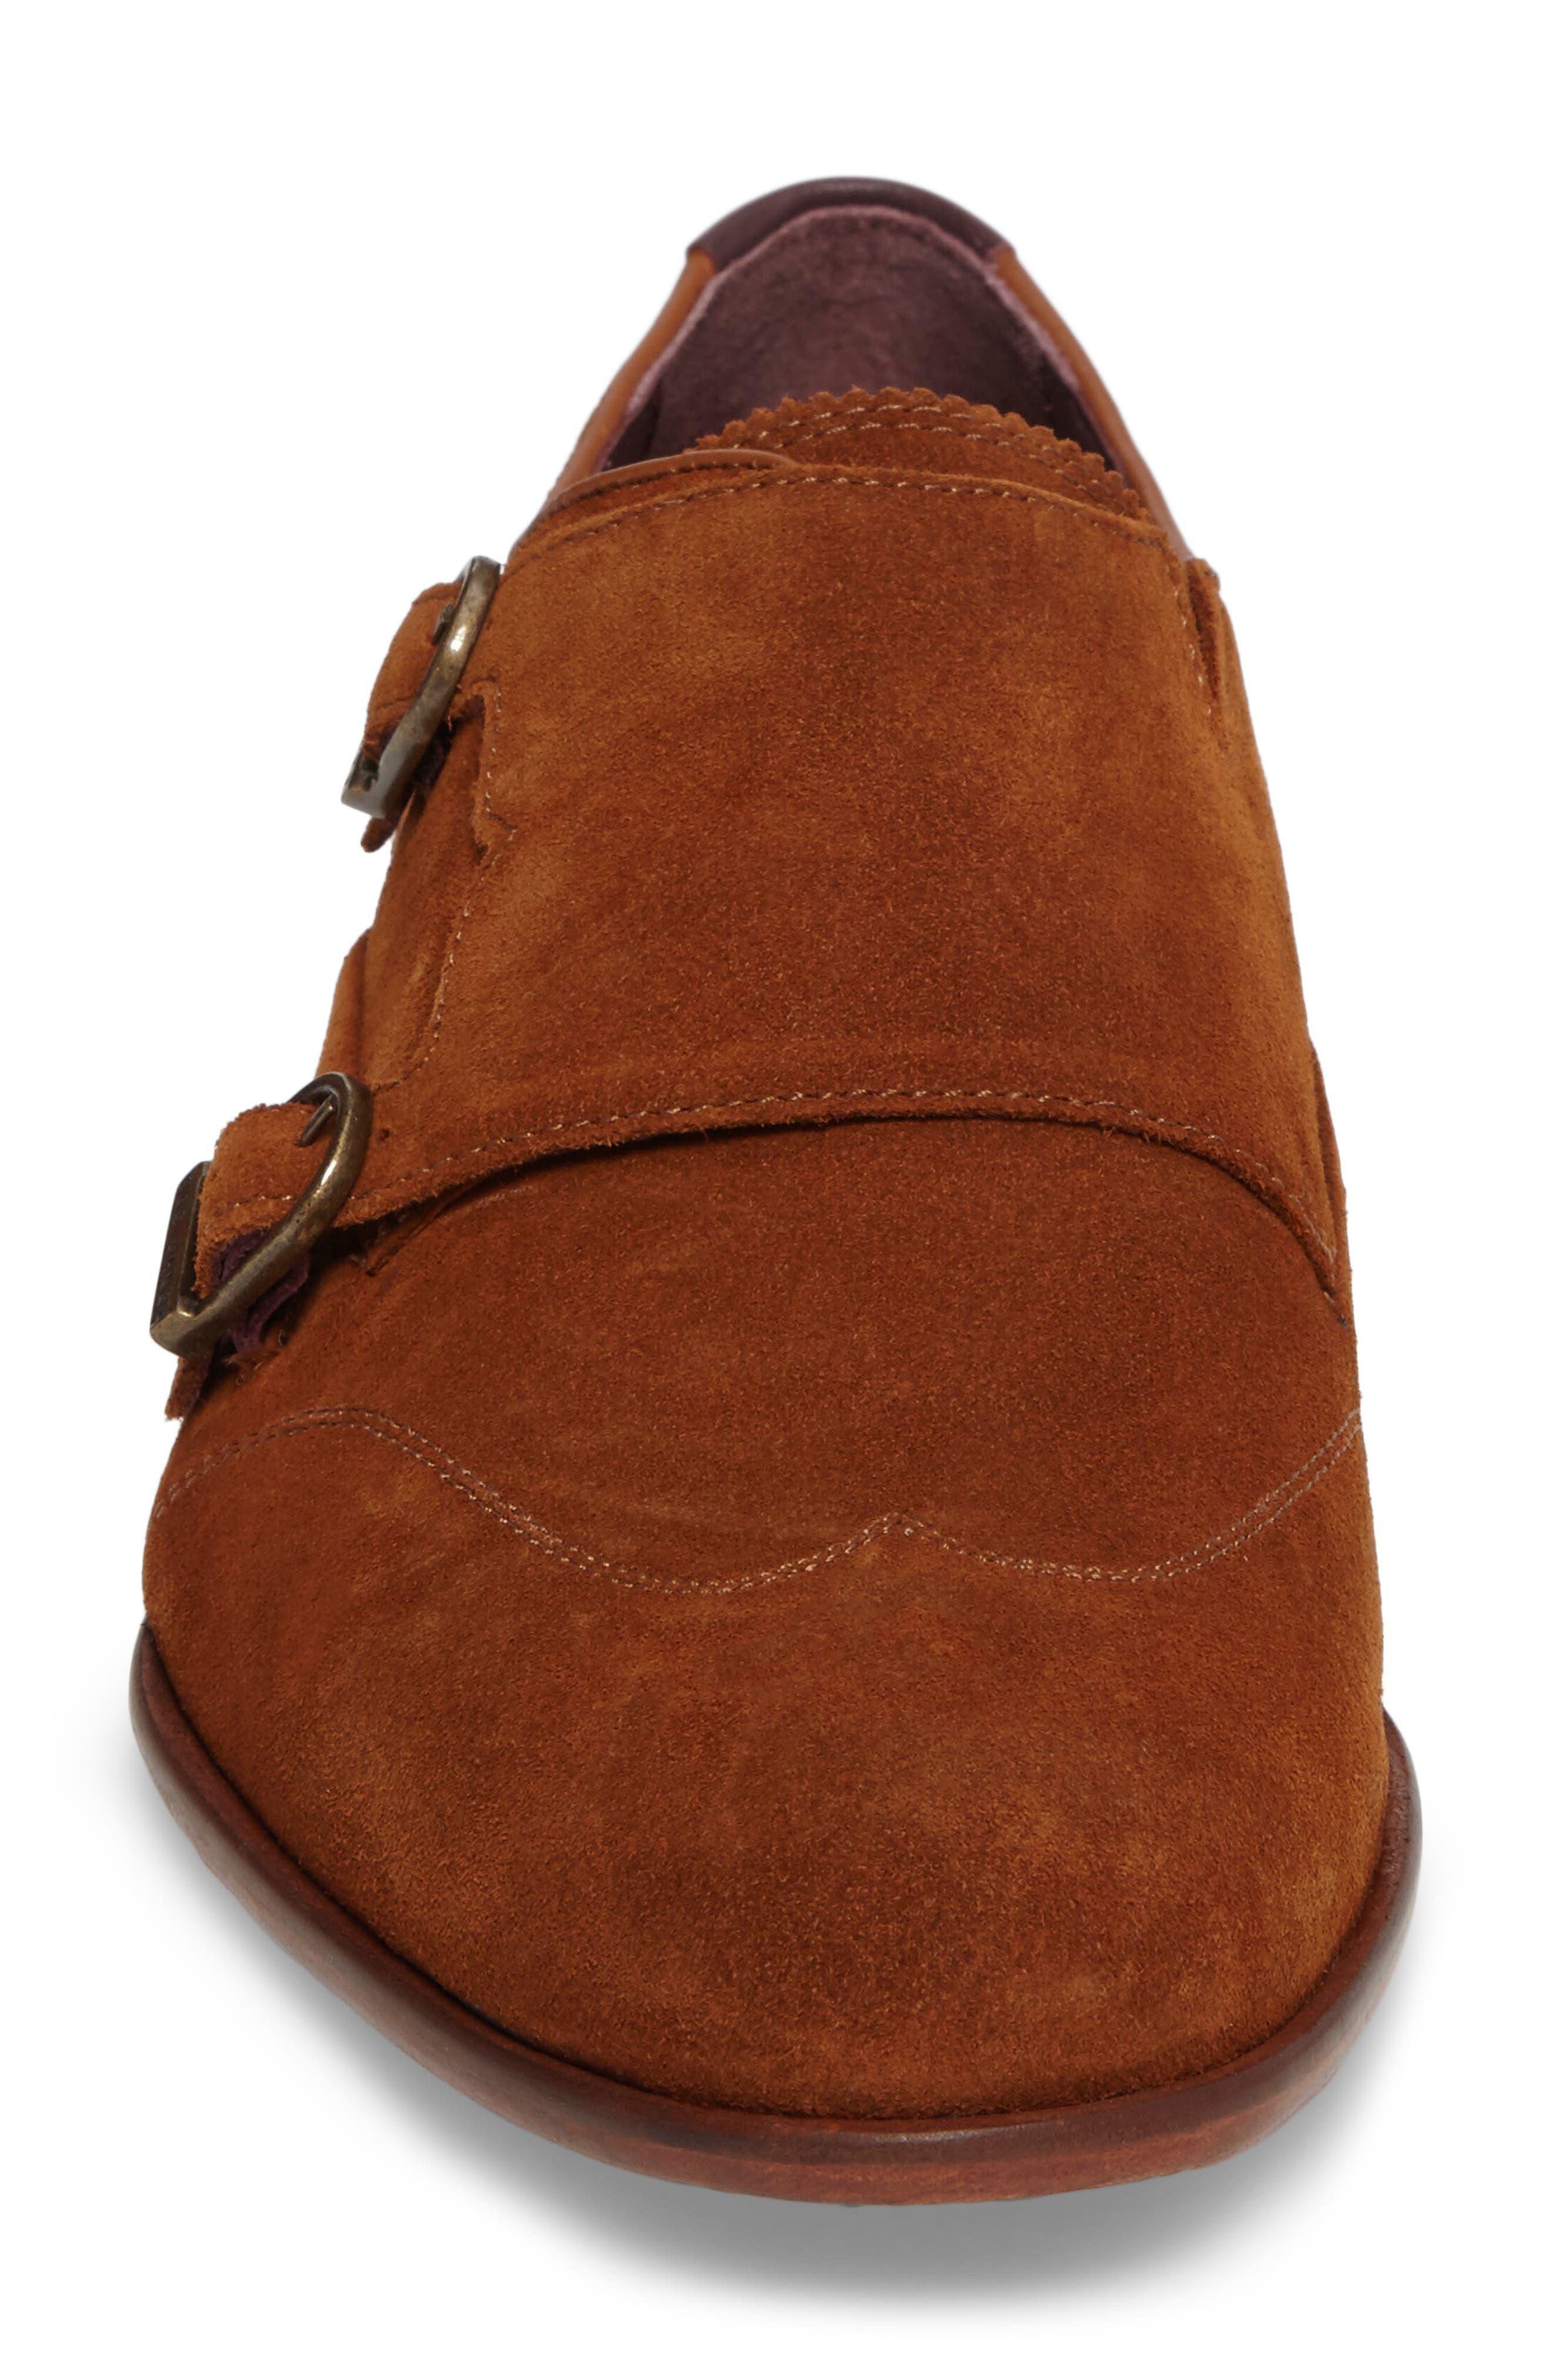 Rovere Wingtip Monk Shoe,                             Alternate thumbnail 4, color,                             TAN SUEDE